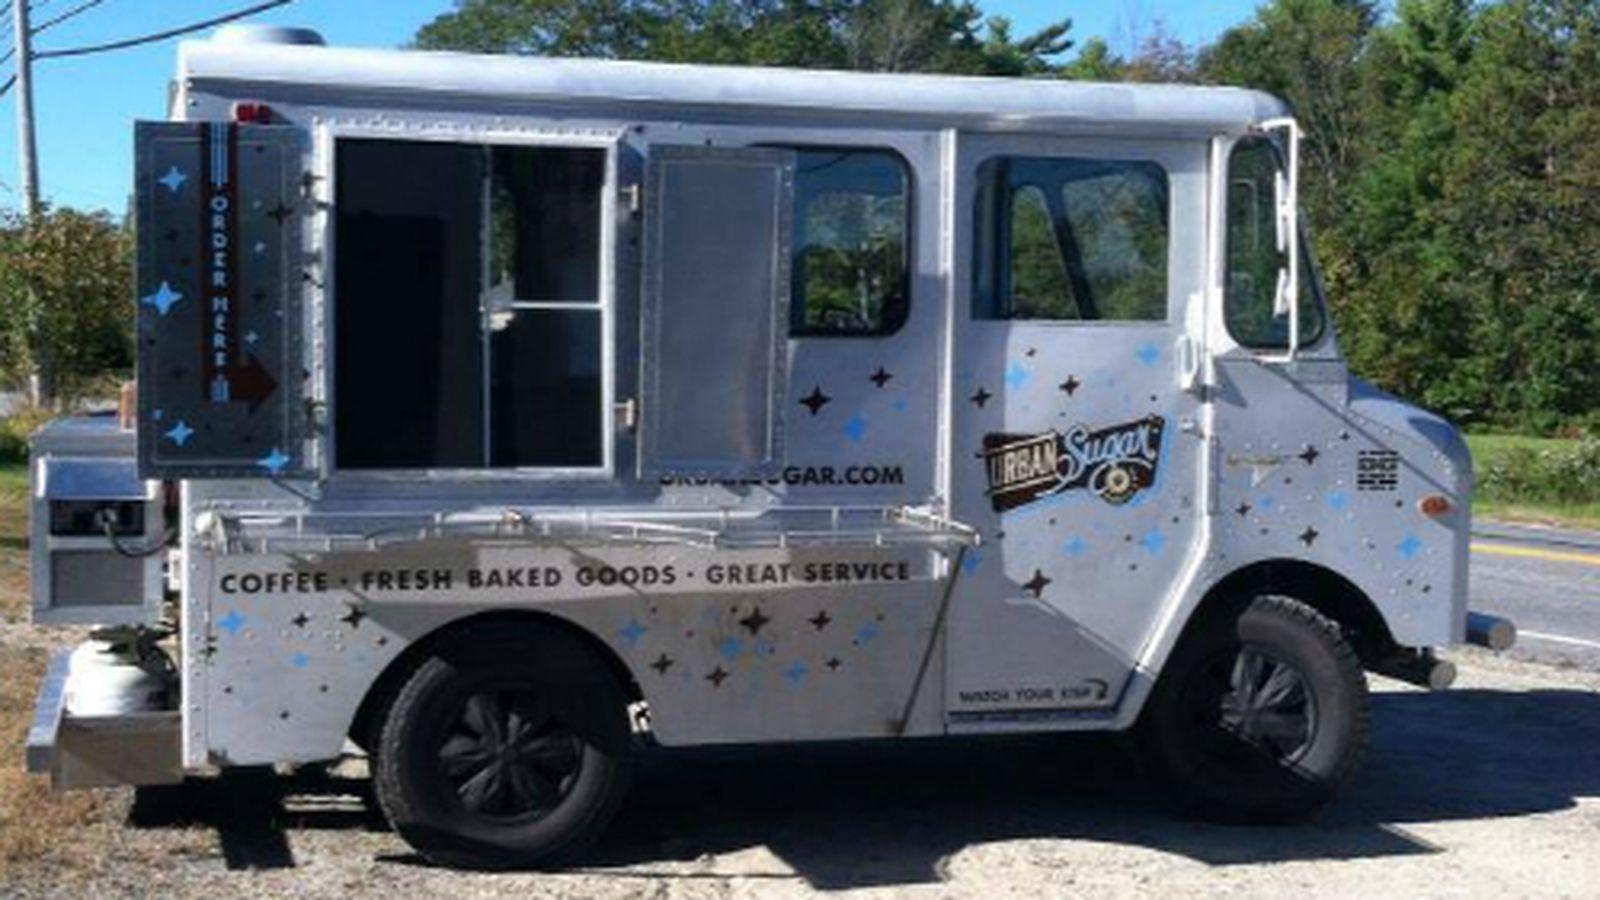 New York Tom S Food Truck